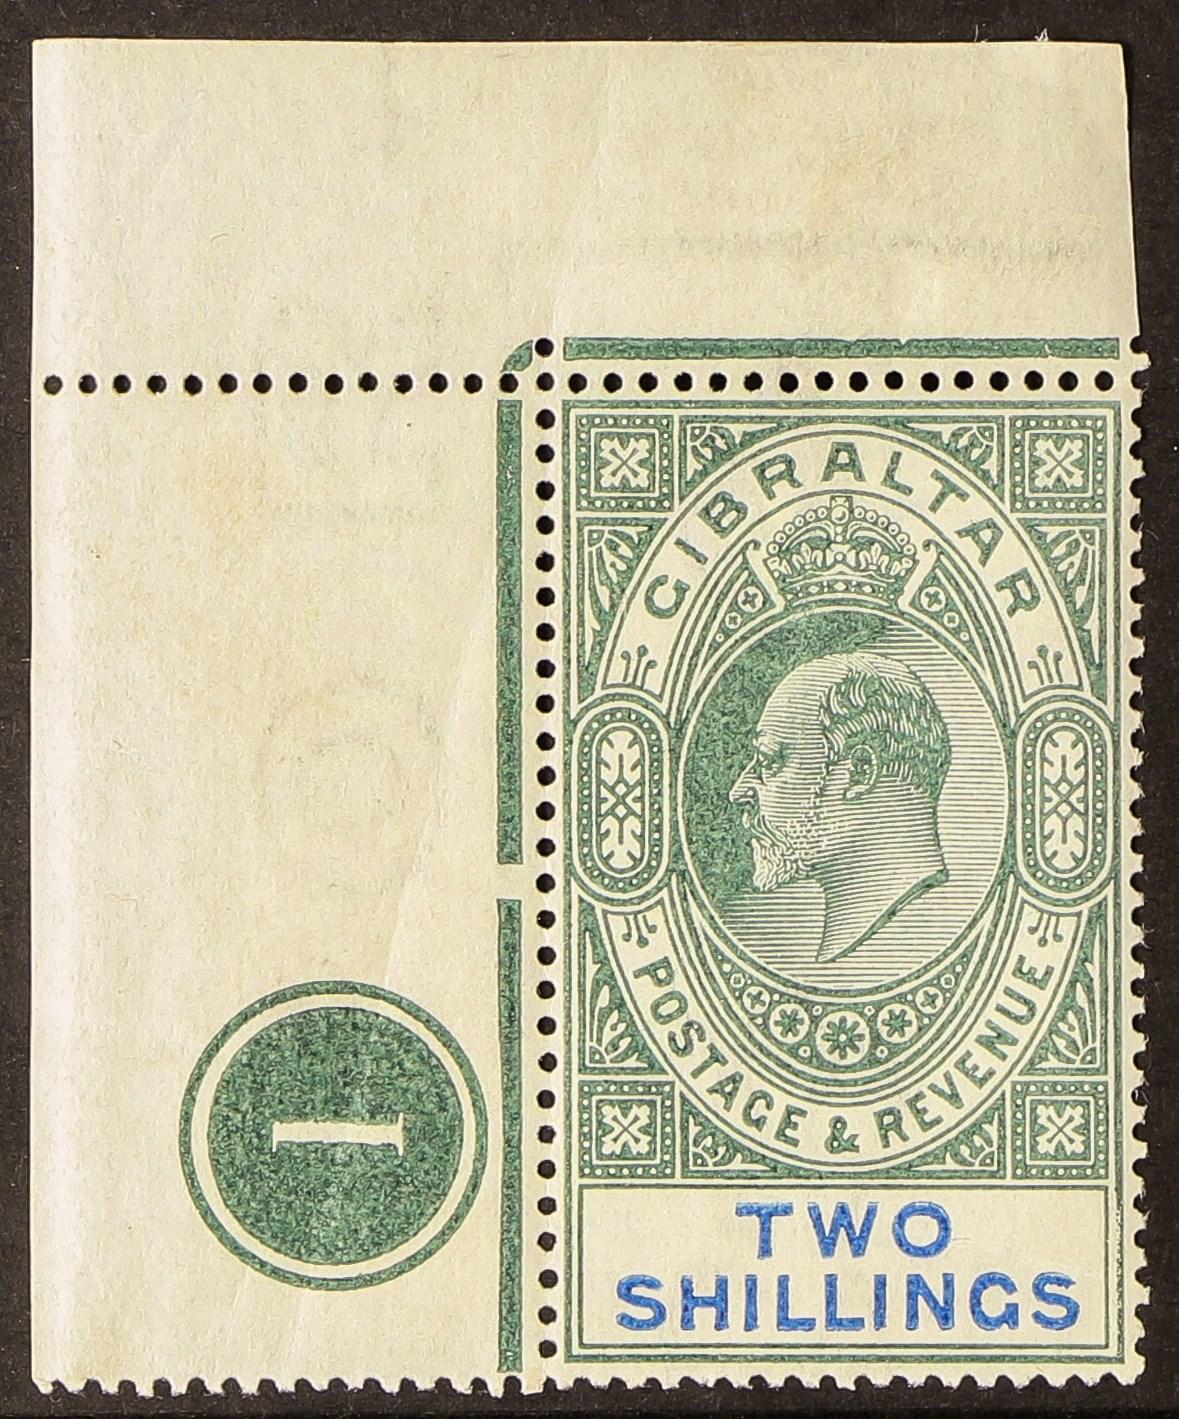 GIBRALTAR 1903 2s green and blue, SG 52, upper left corner plate number example, stamp never